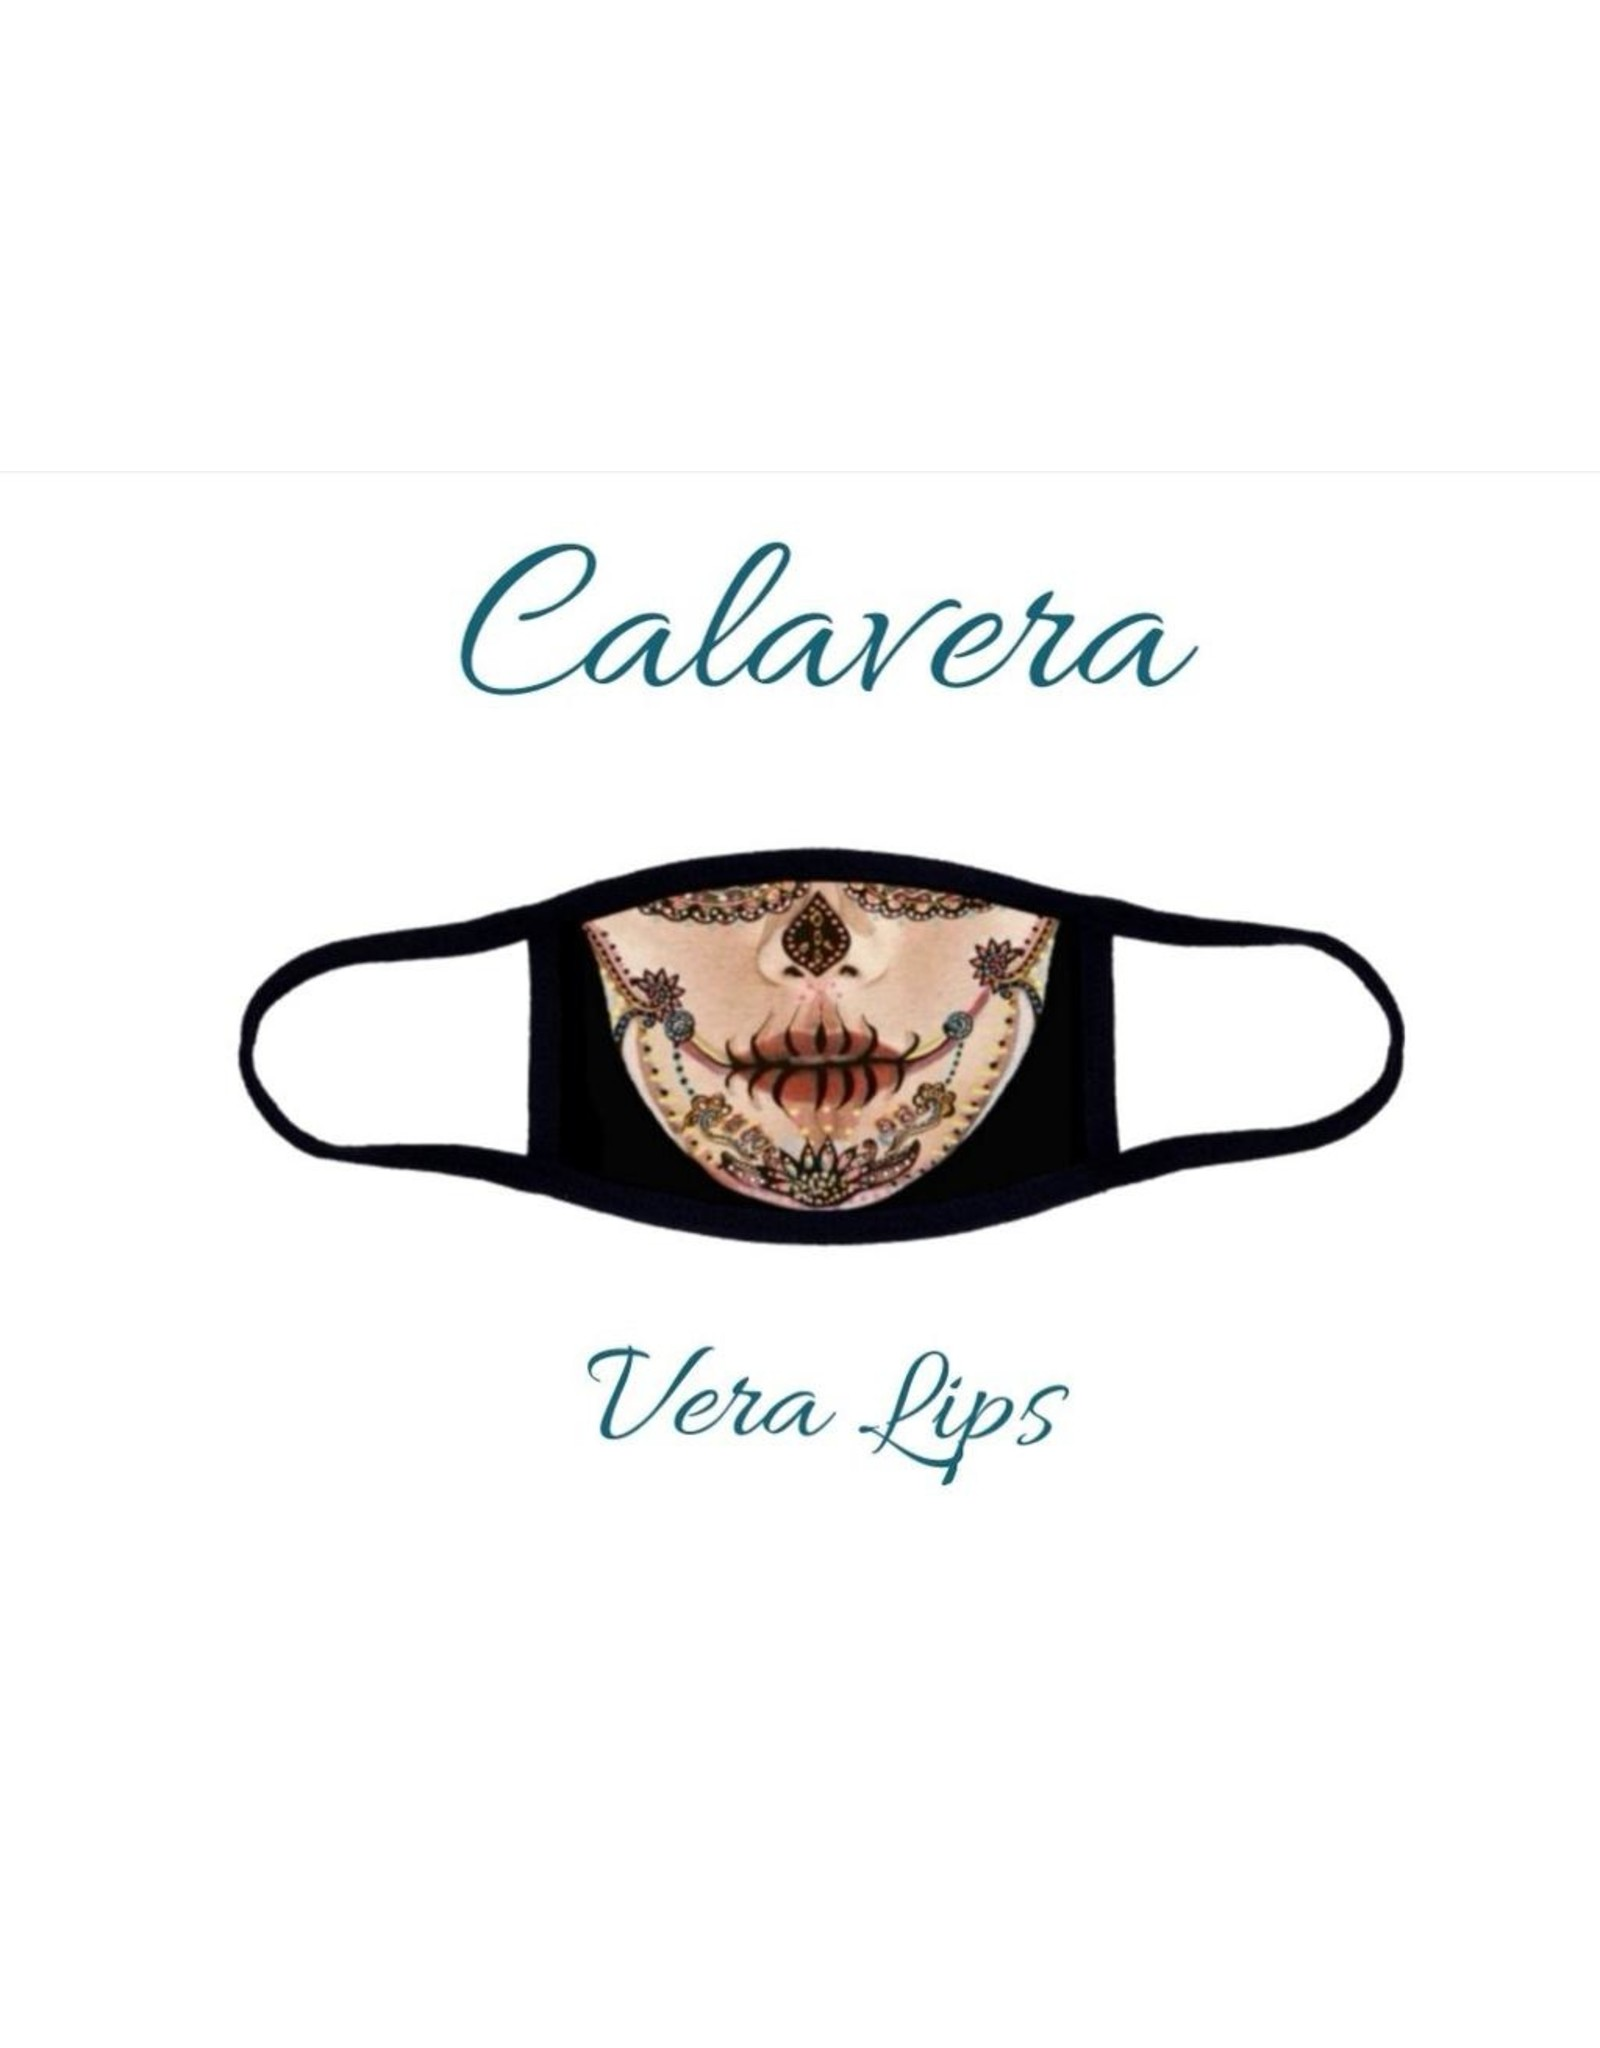 Catherine Eager Art Catherine Eager Art - Vera Lips-Calavera